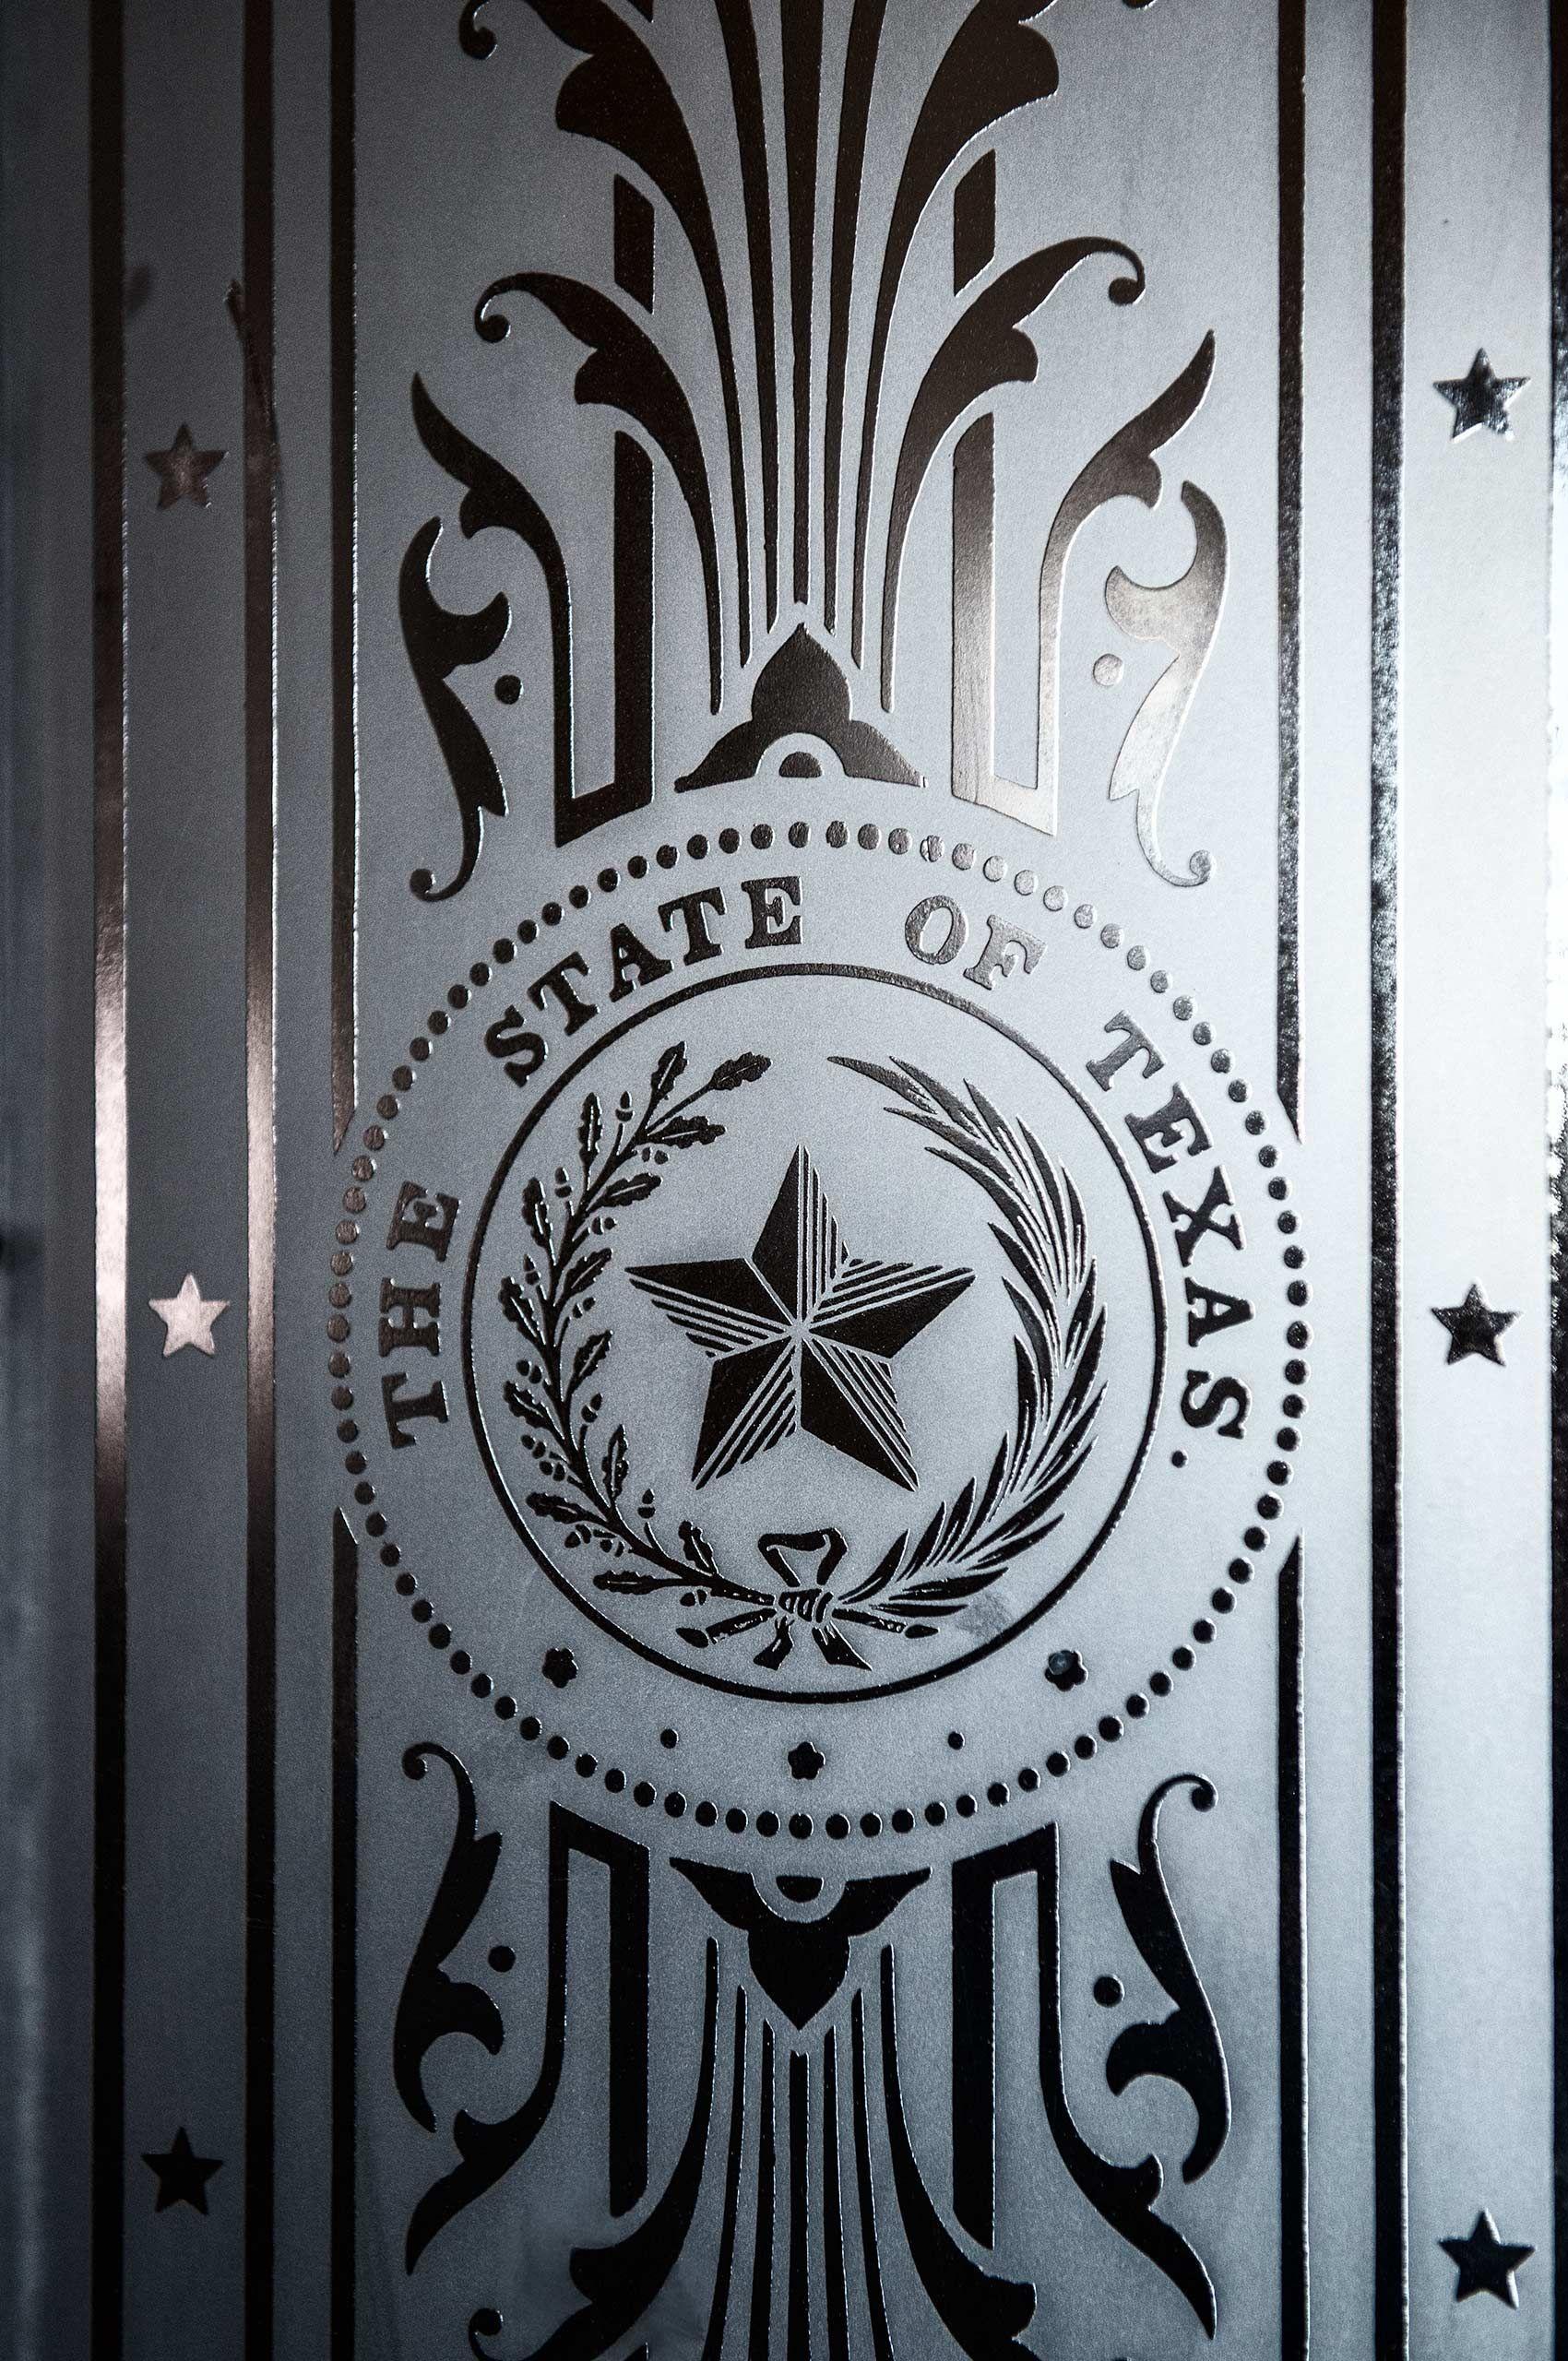 StateOfTexas-Emblem-Glass-Door-HenrikOlundPhotography.jpg